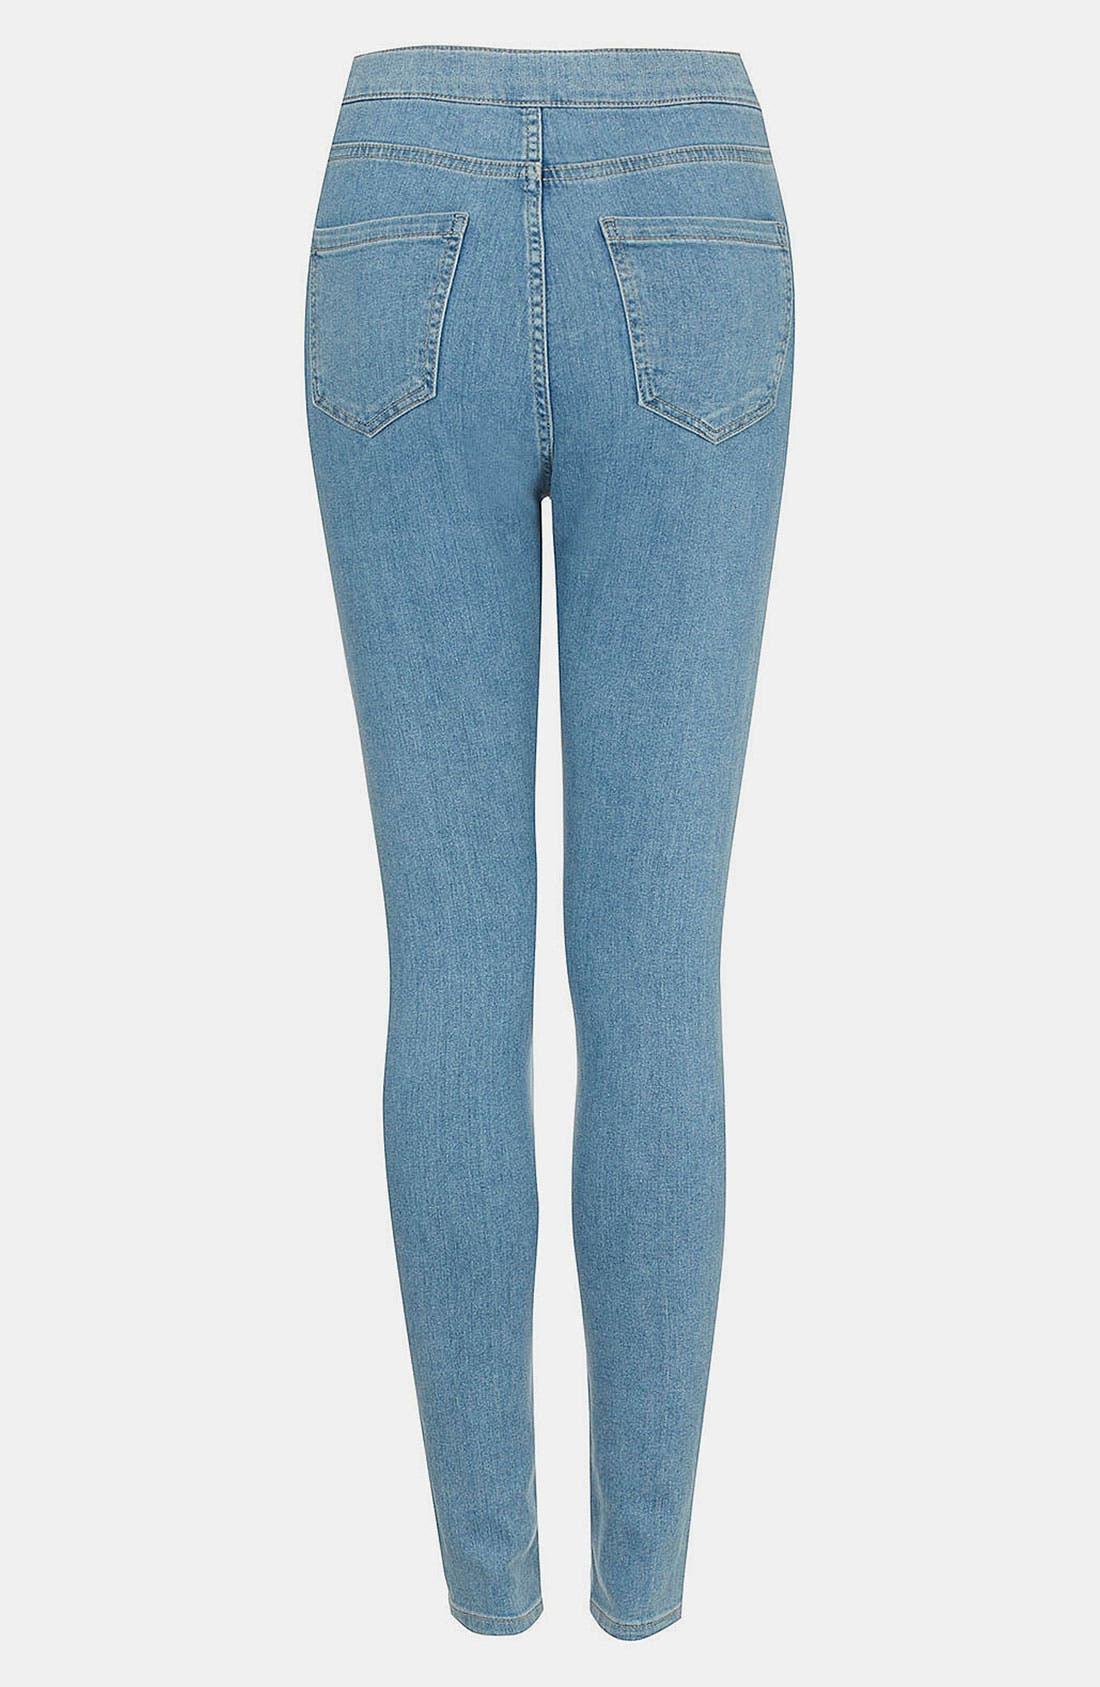 Alternate Image 2  - Topshop Moto 'Joni' High Waist Skinny Jeans (Mid Stone) (Short)